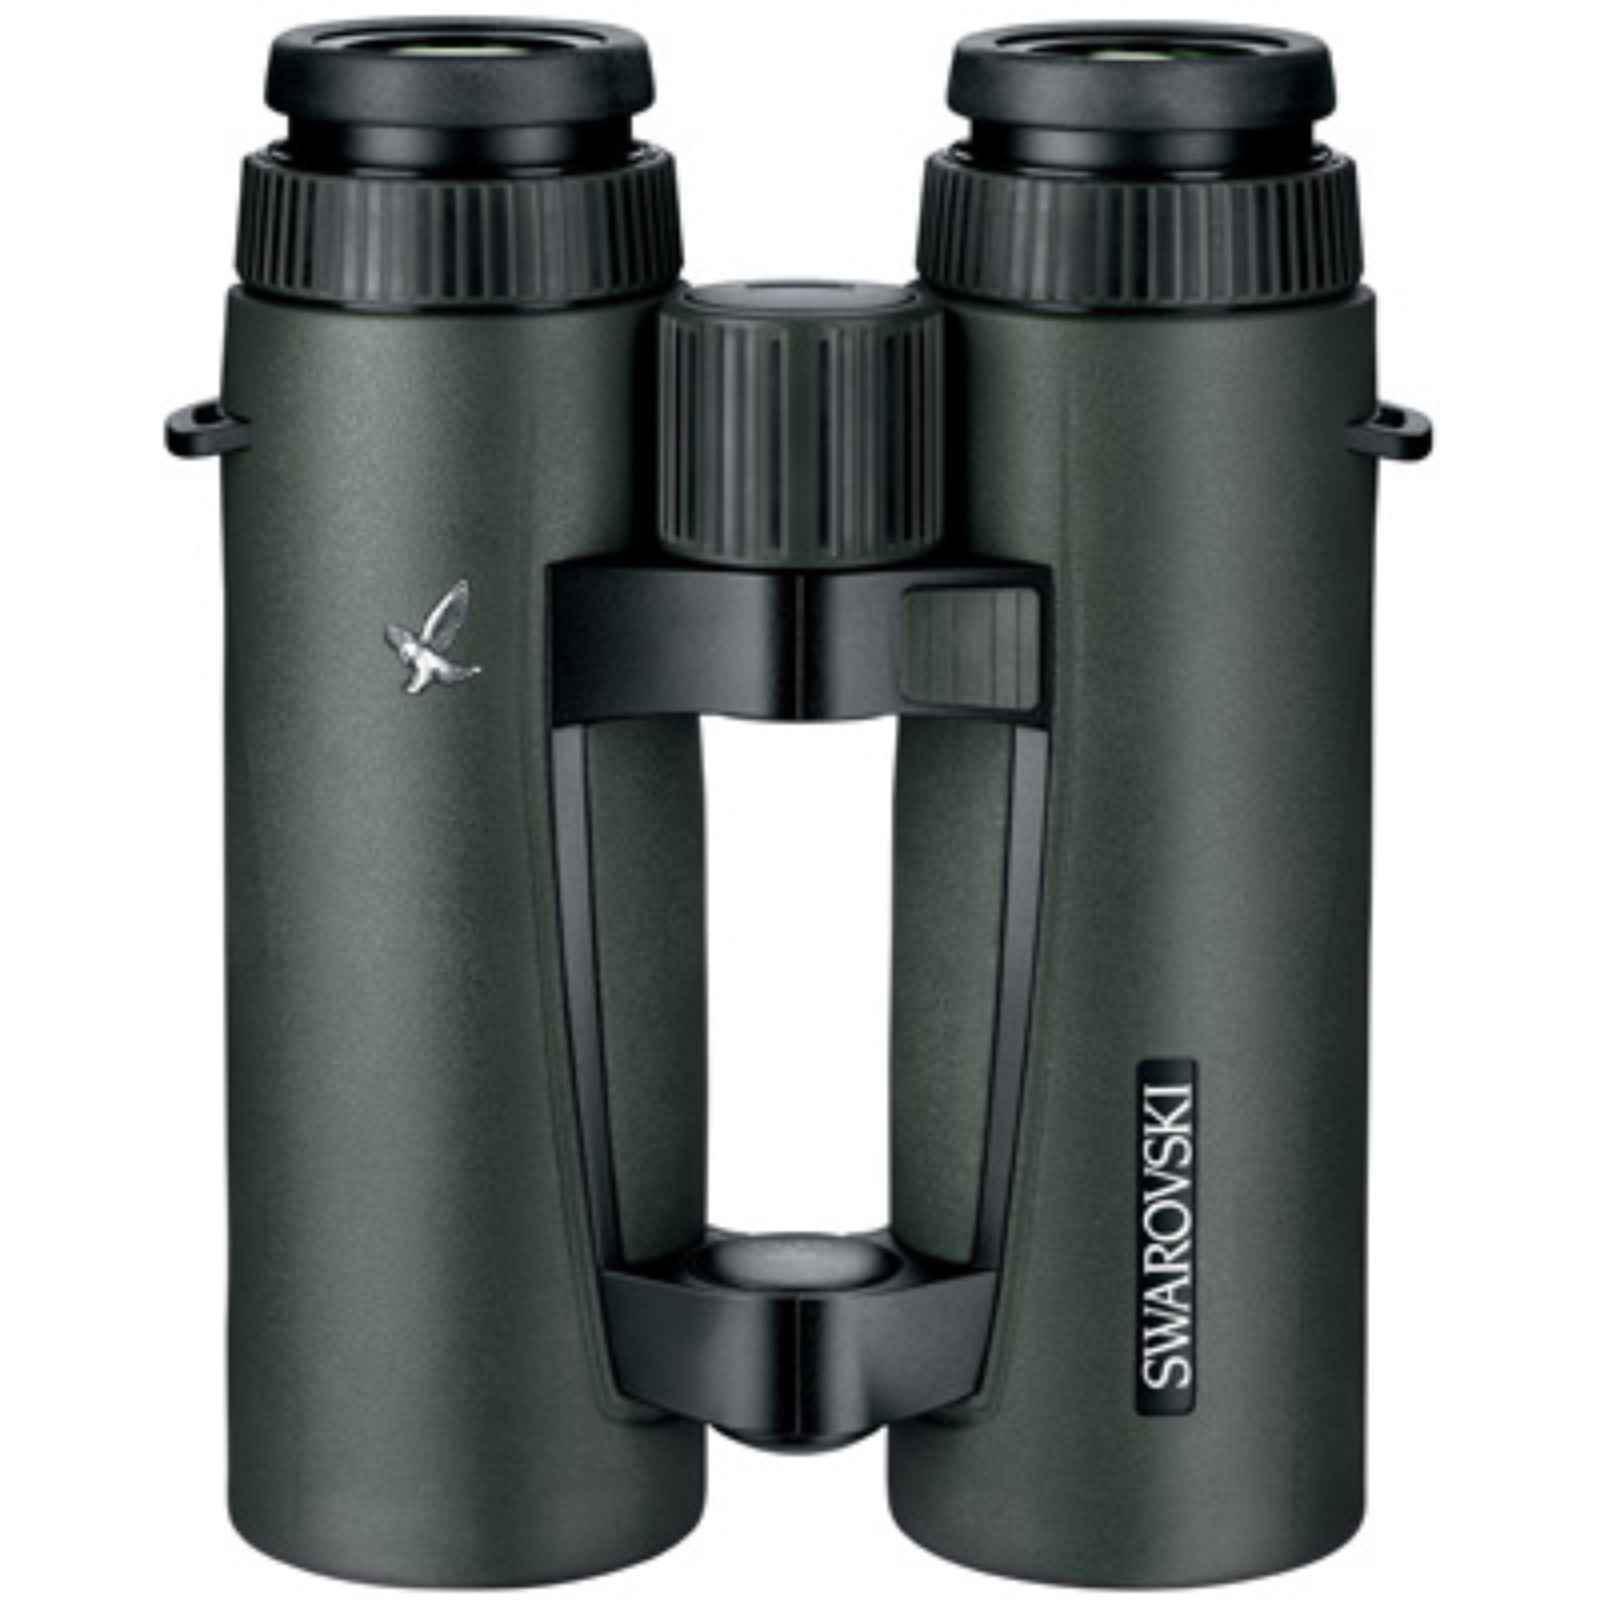 Swarovski EL Range Laser Rangefinding Binocular 10x-42mm Roof Prism Green, 70020 by Swarovski Optik